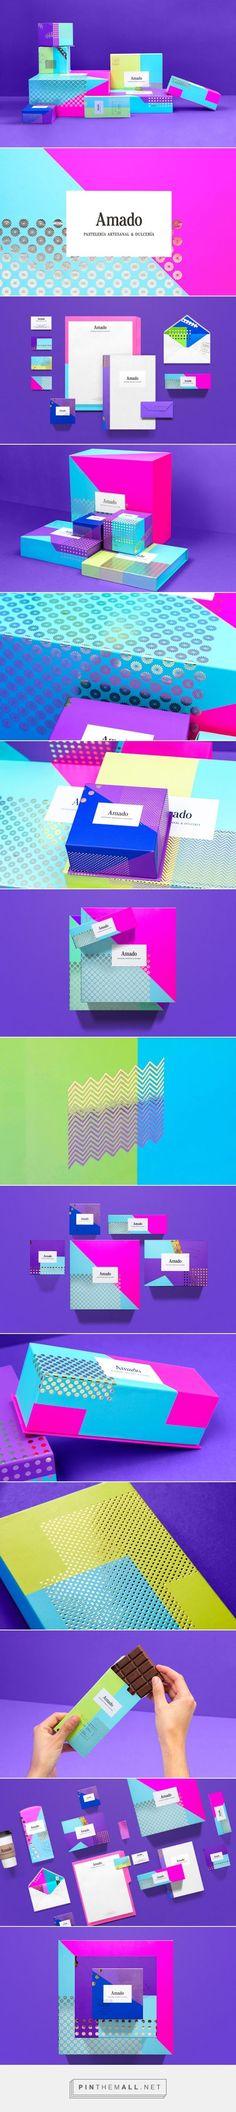 Amado by Hyatt #packaging designed by Anagrama - http://www.packagingoftheworld.com/2015/01/amado-by-hyatt.html